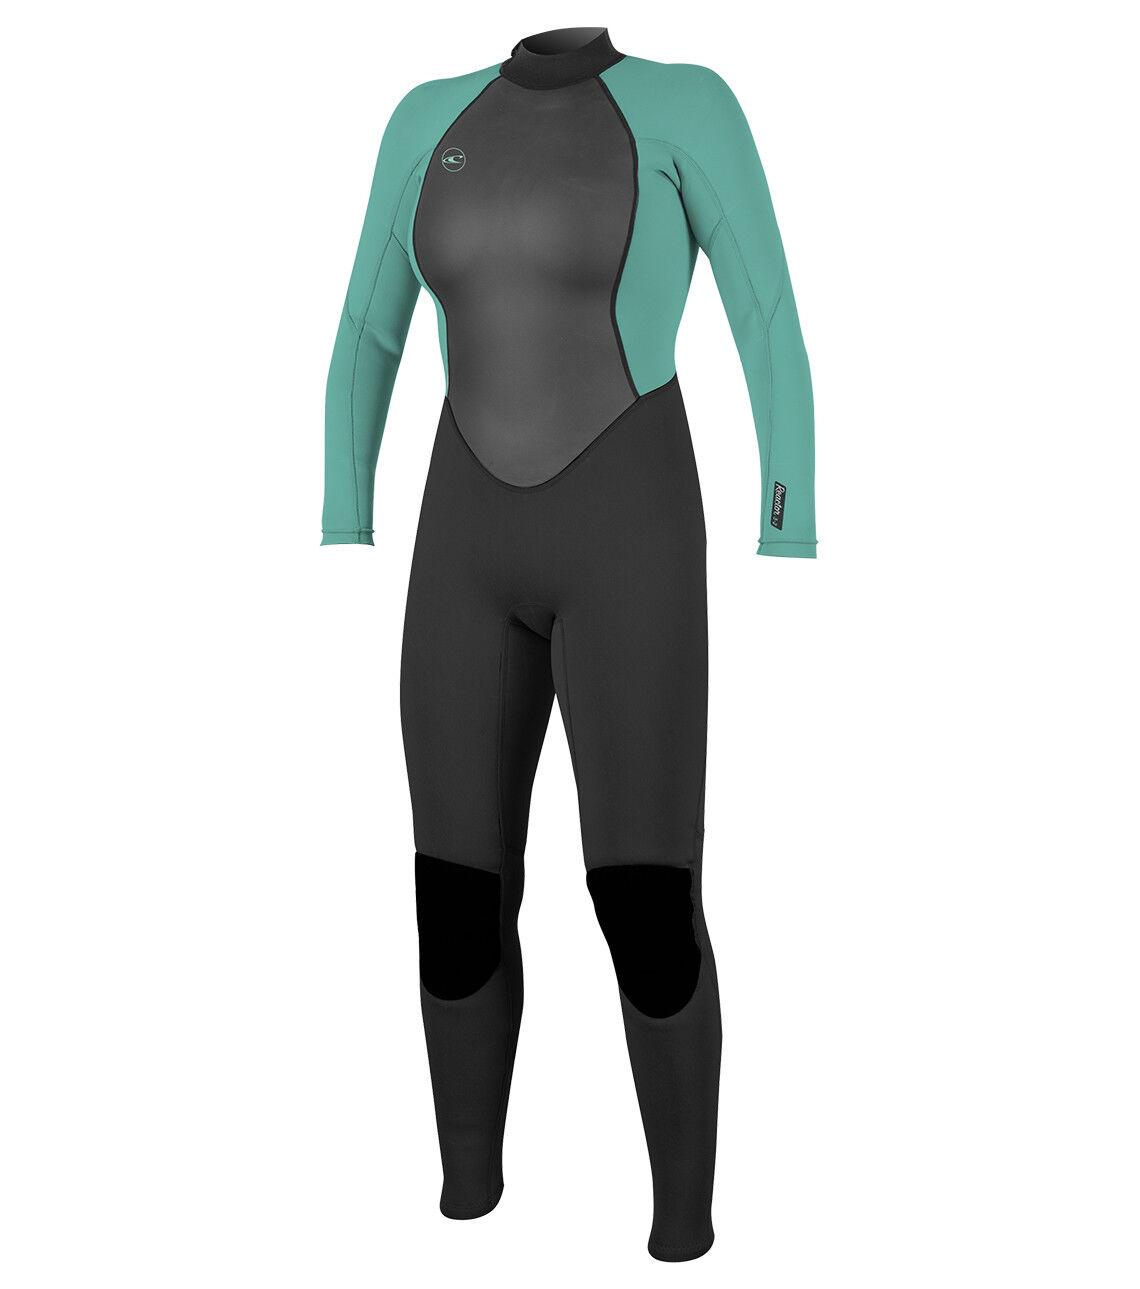 O'Neill Reactor II 3 2mm Ladies Wetsuit 2018 - Blk   Ltaqua